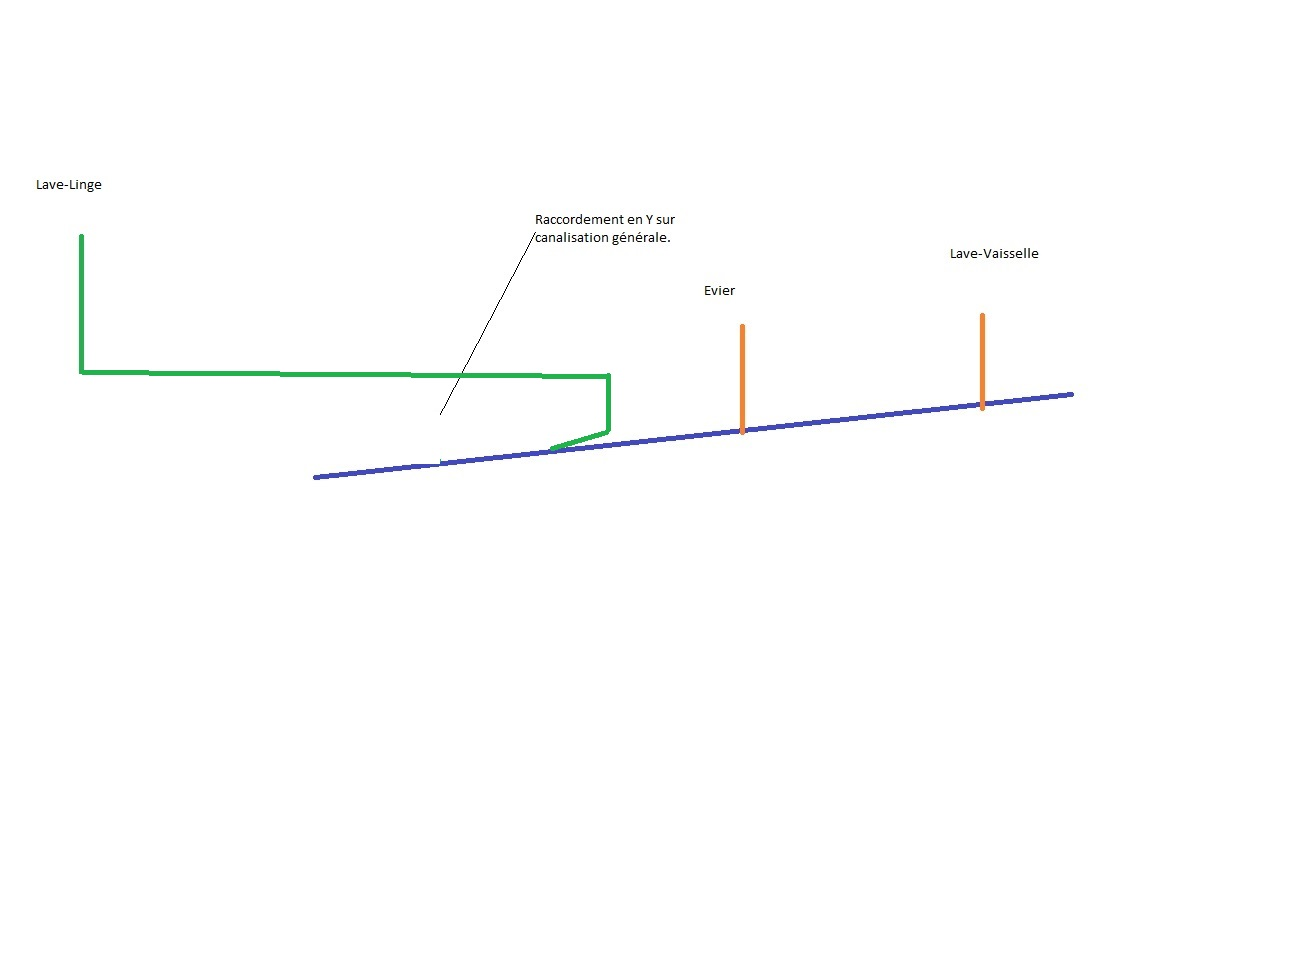 Plan évacuation lave linge 3.jpg, 42.47 kb, 1296 x 968